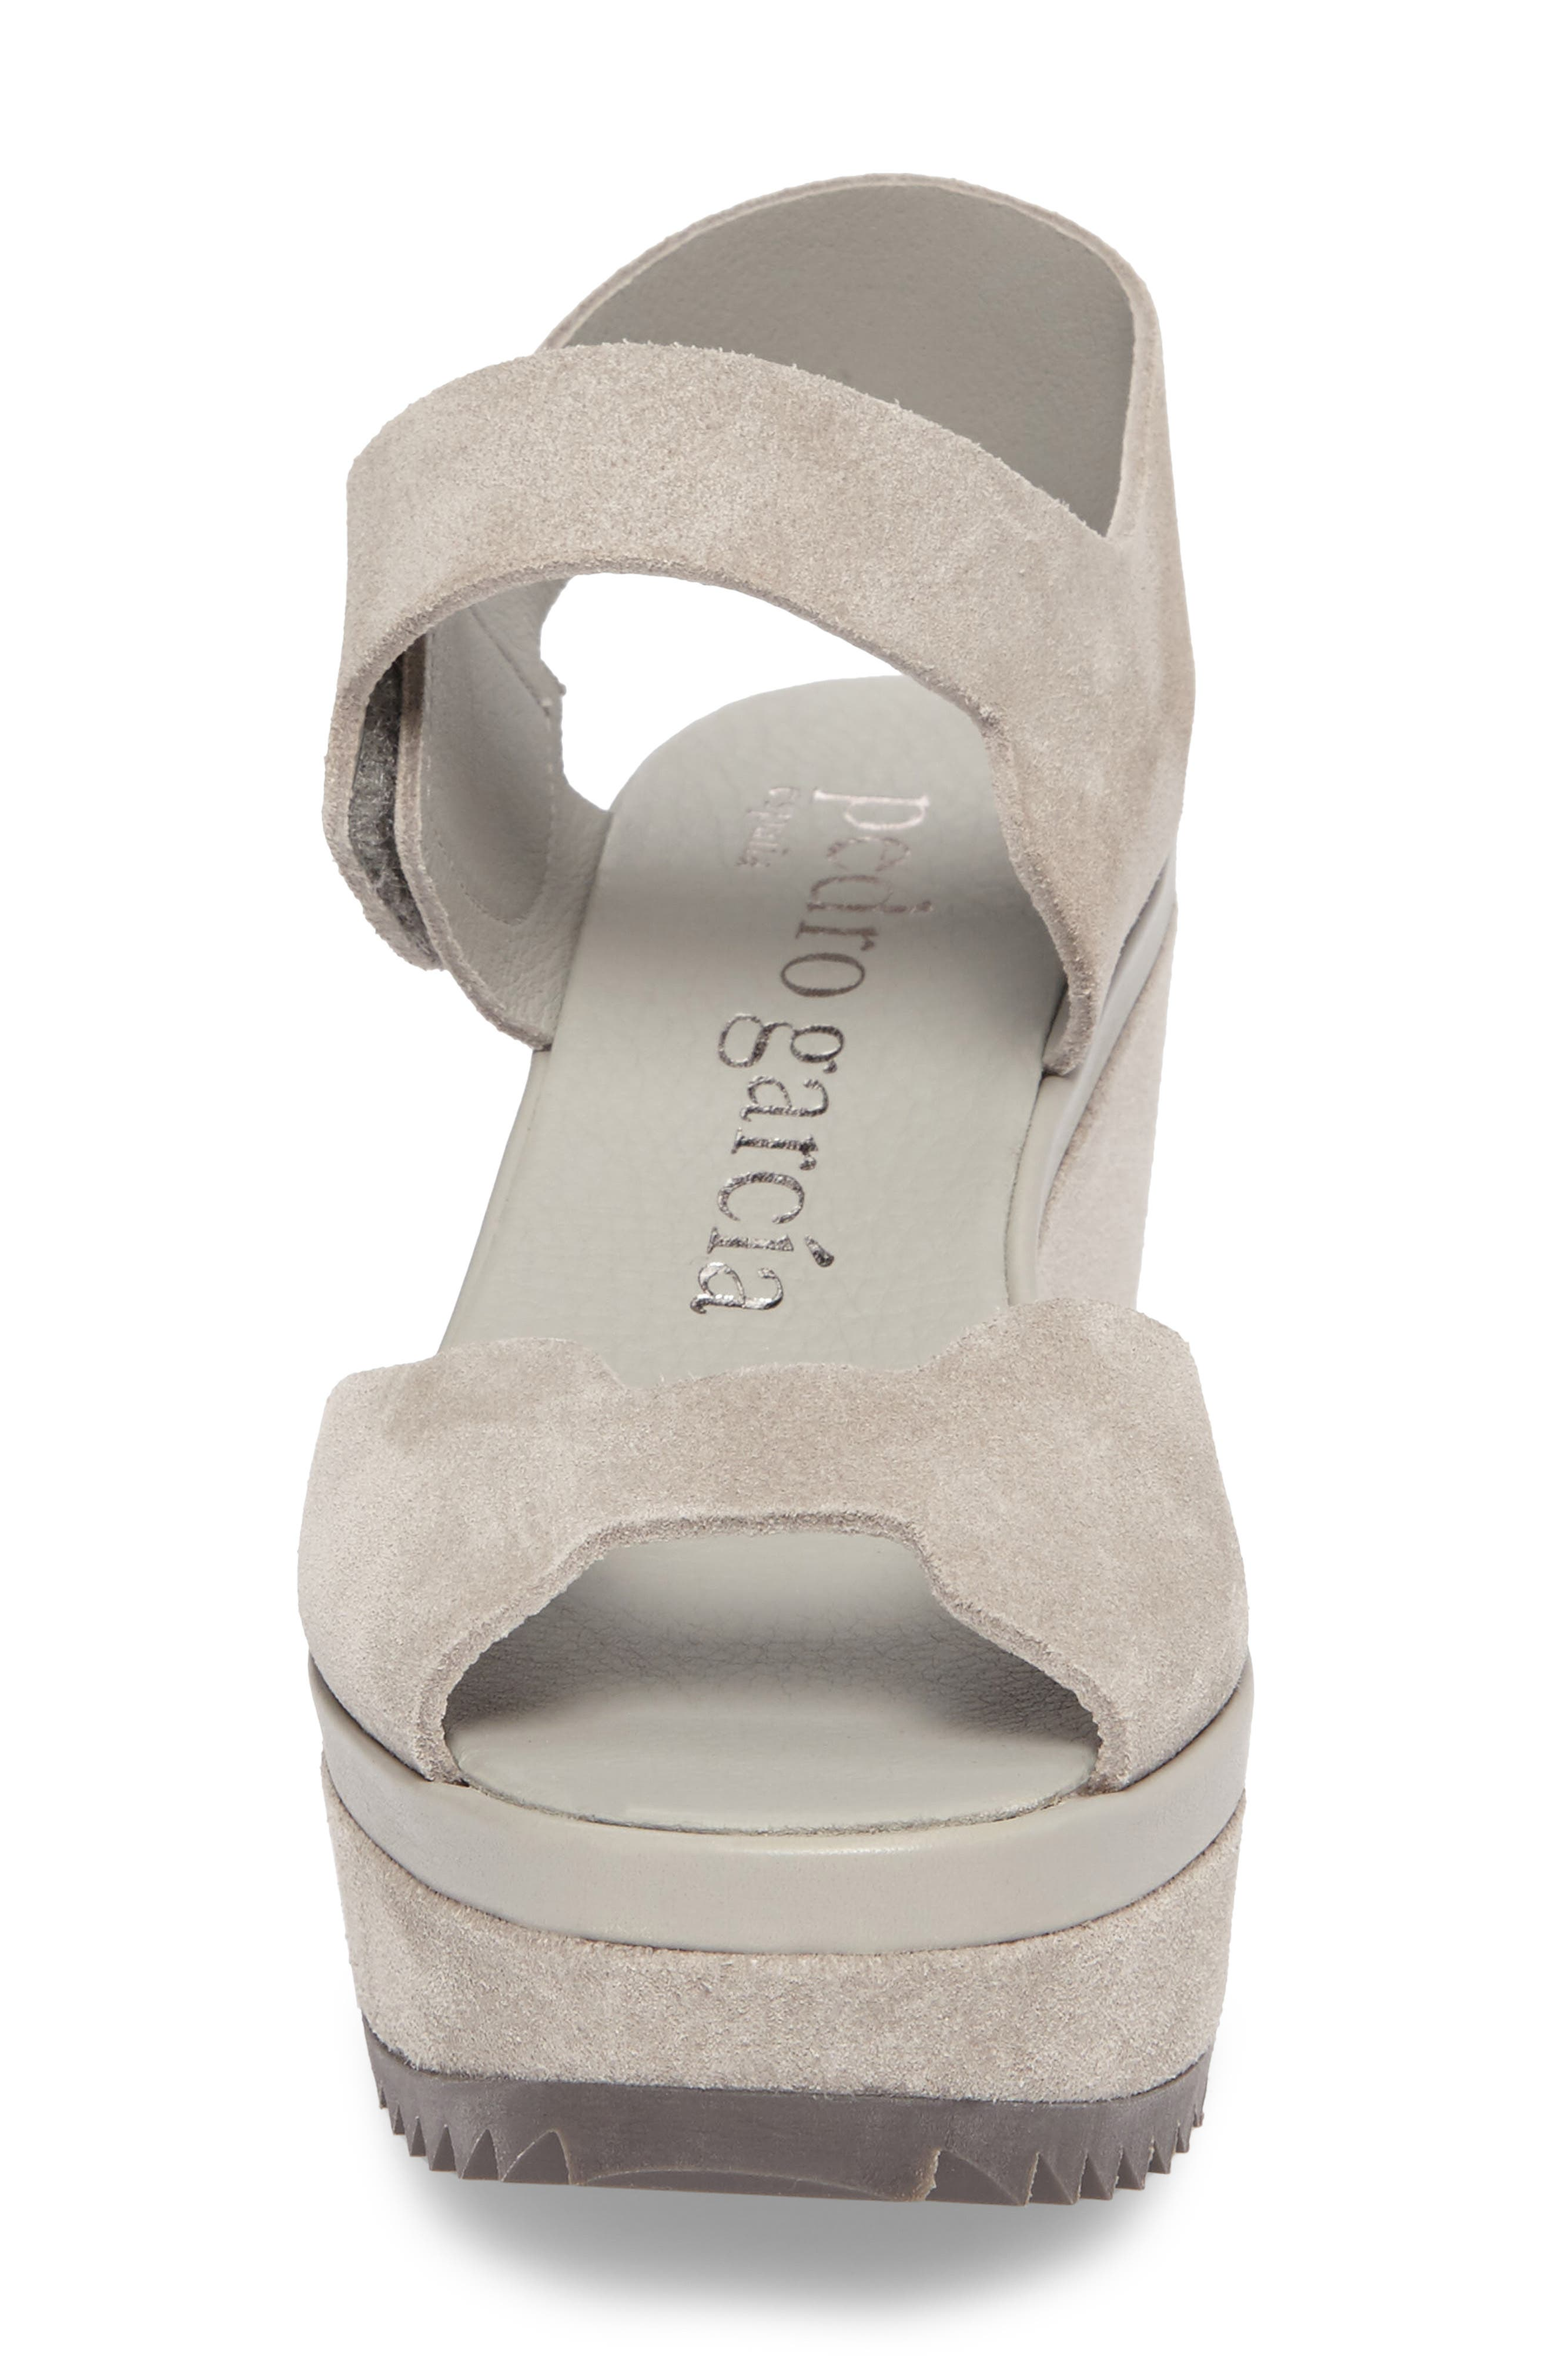 Fah Platform Wedge Sandal,                             Alternate thumbnail 4, color,                             Pumice Castoro